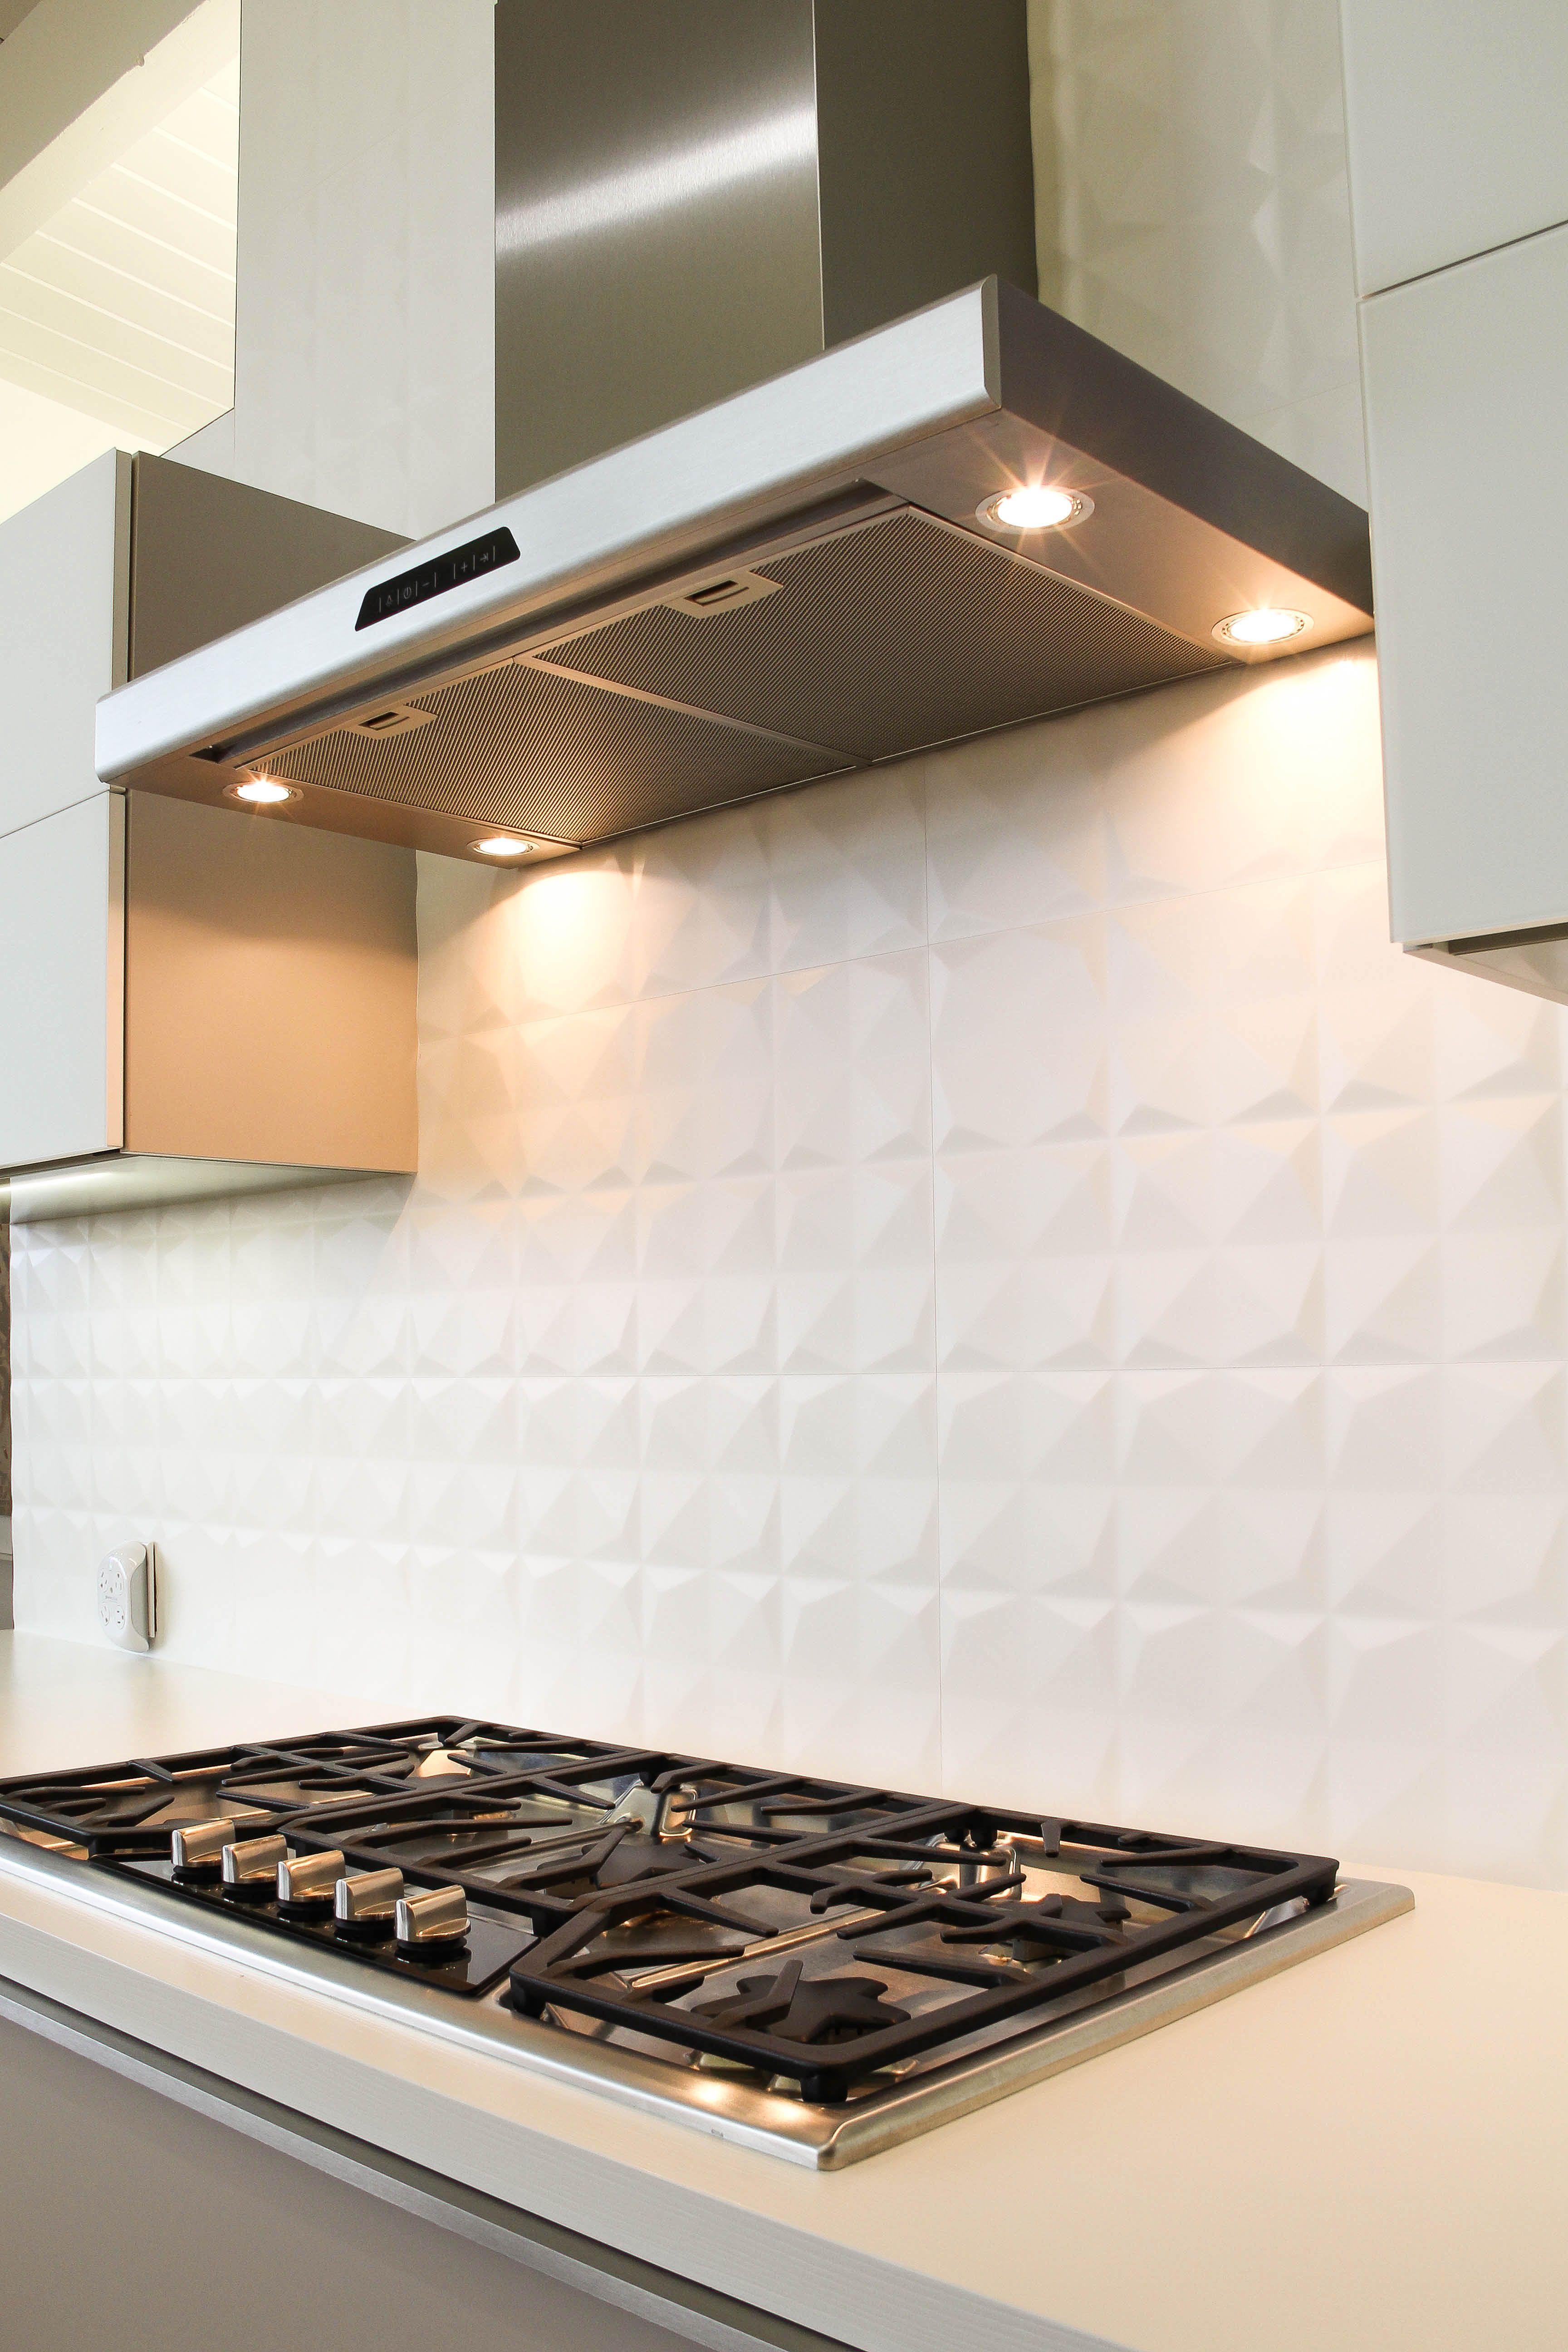 Silestone integrity sink with recess drainer - Bauformat Kitchen Cabinet Front 241 Sand Beige Silky Matt Front 337 Factory